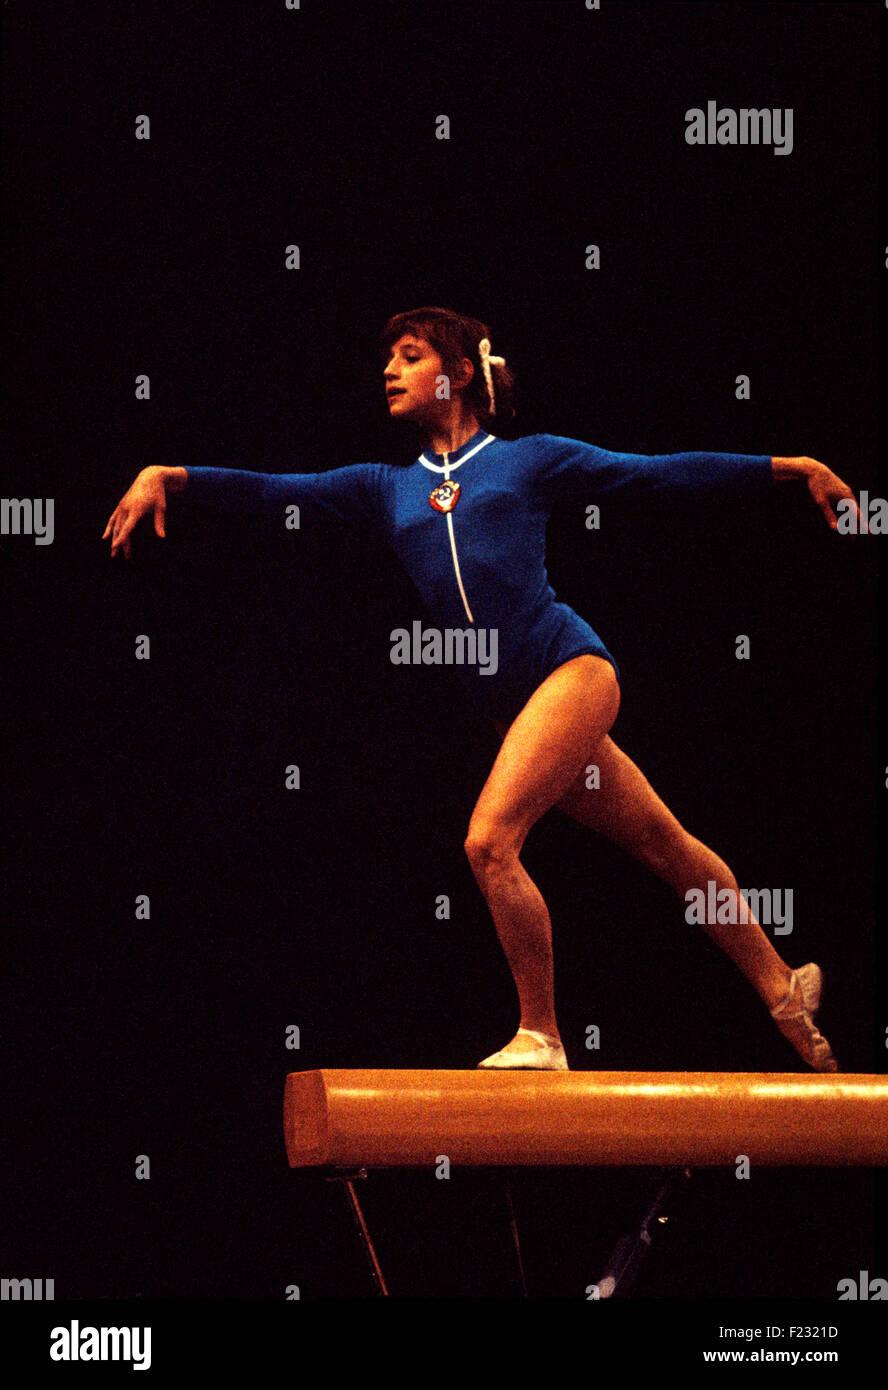 Watch Olga Korbut 6 Olympic medals video